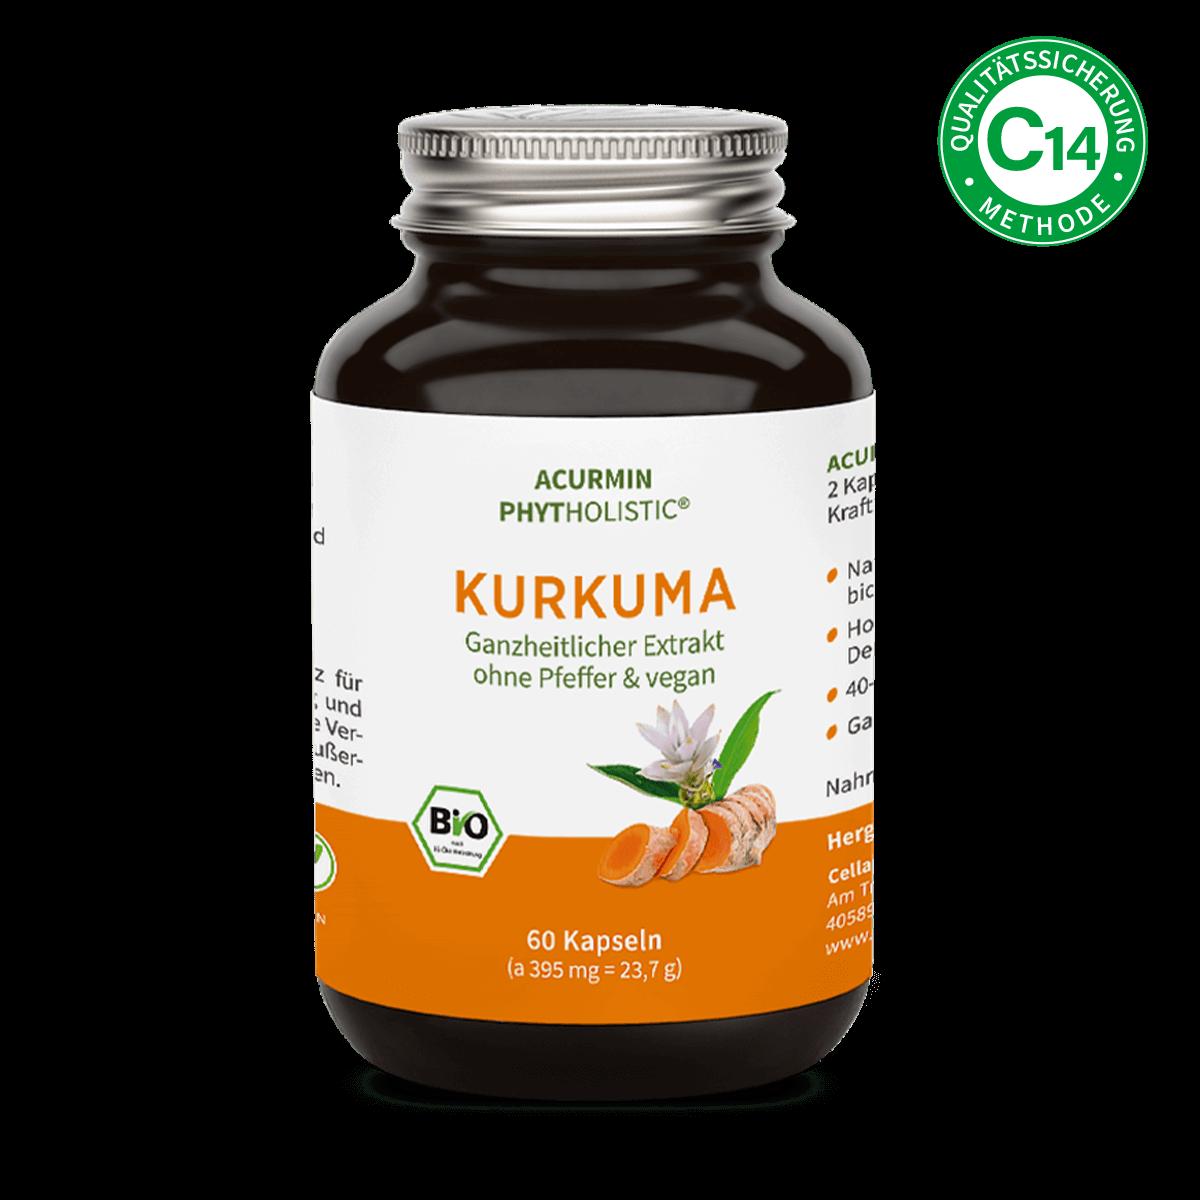 kurkuma-kapseln-bio-acurmin-phytholistic-60-stueck-glas-vorne-mit-siegel-1200×1200